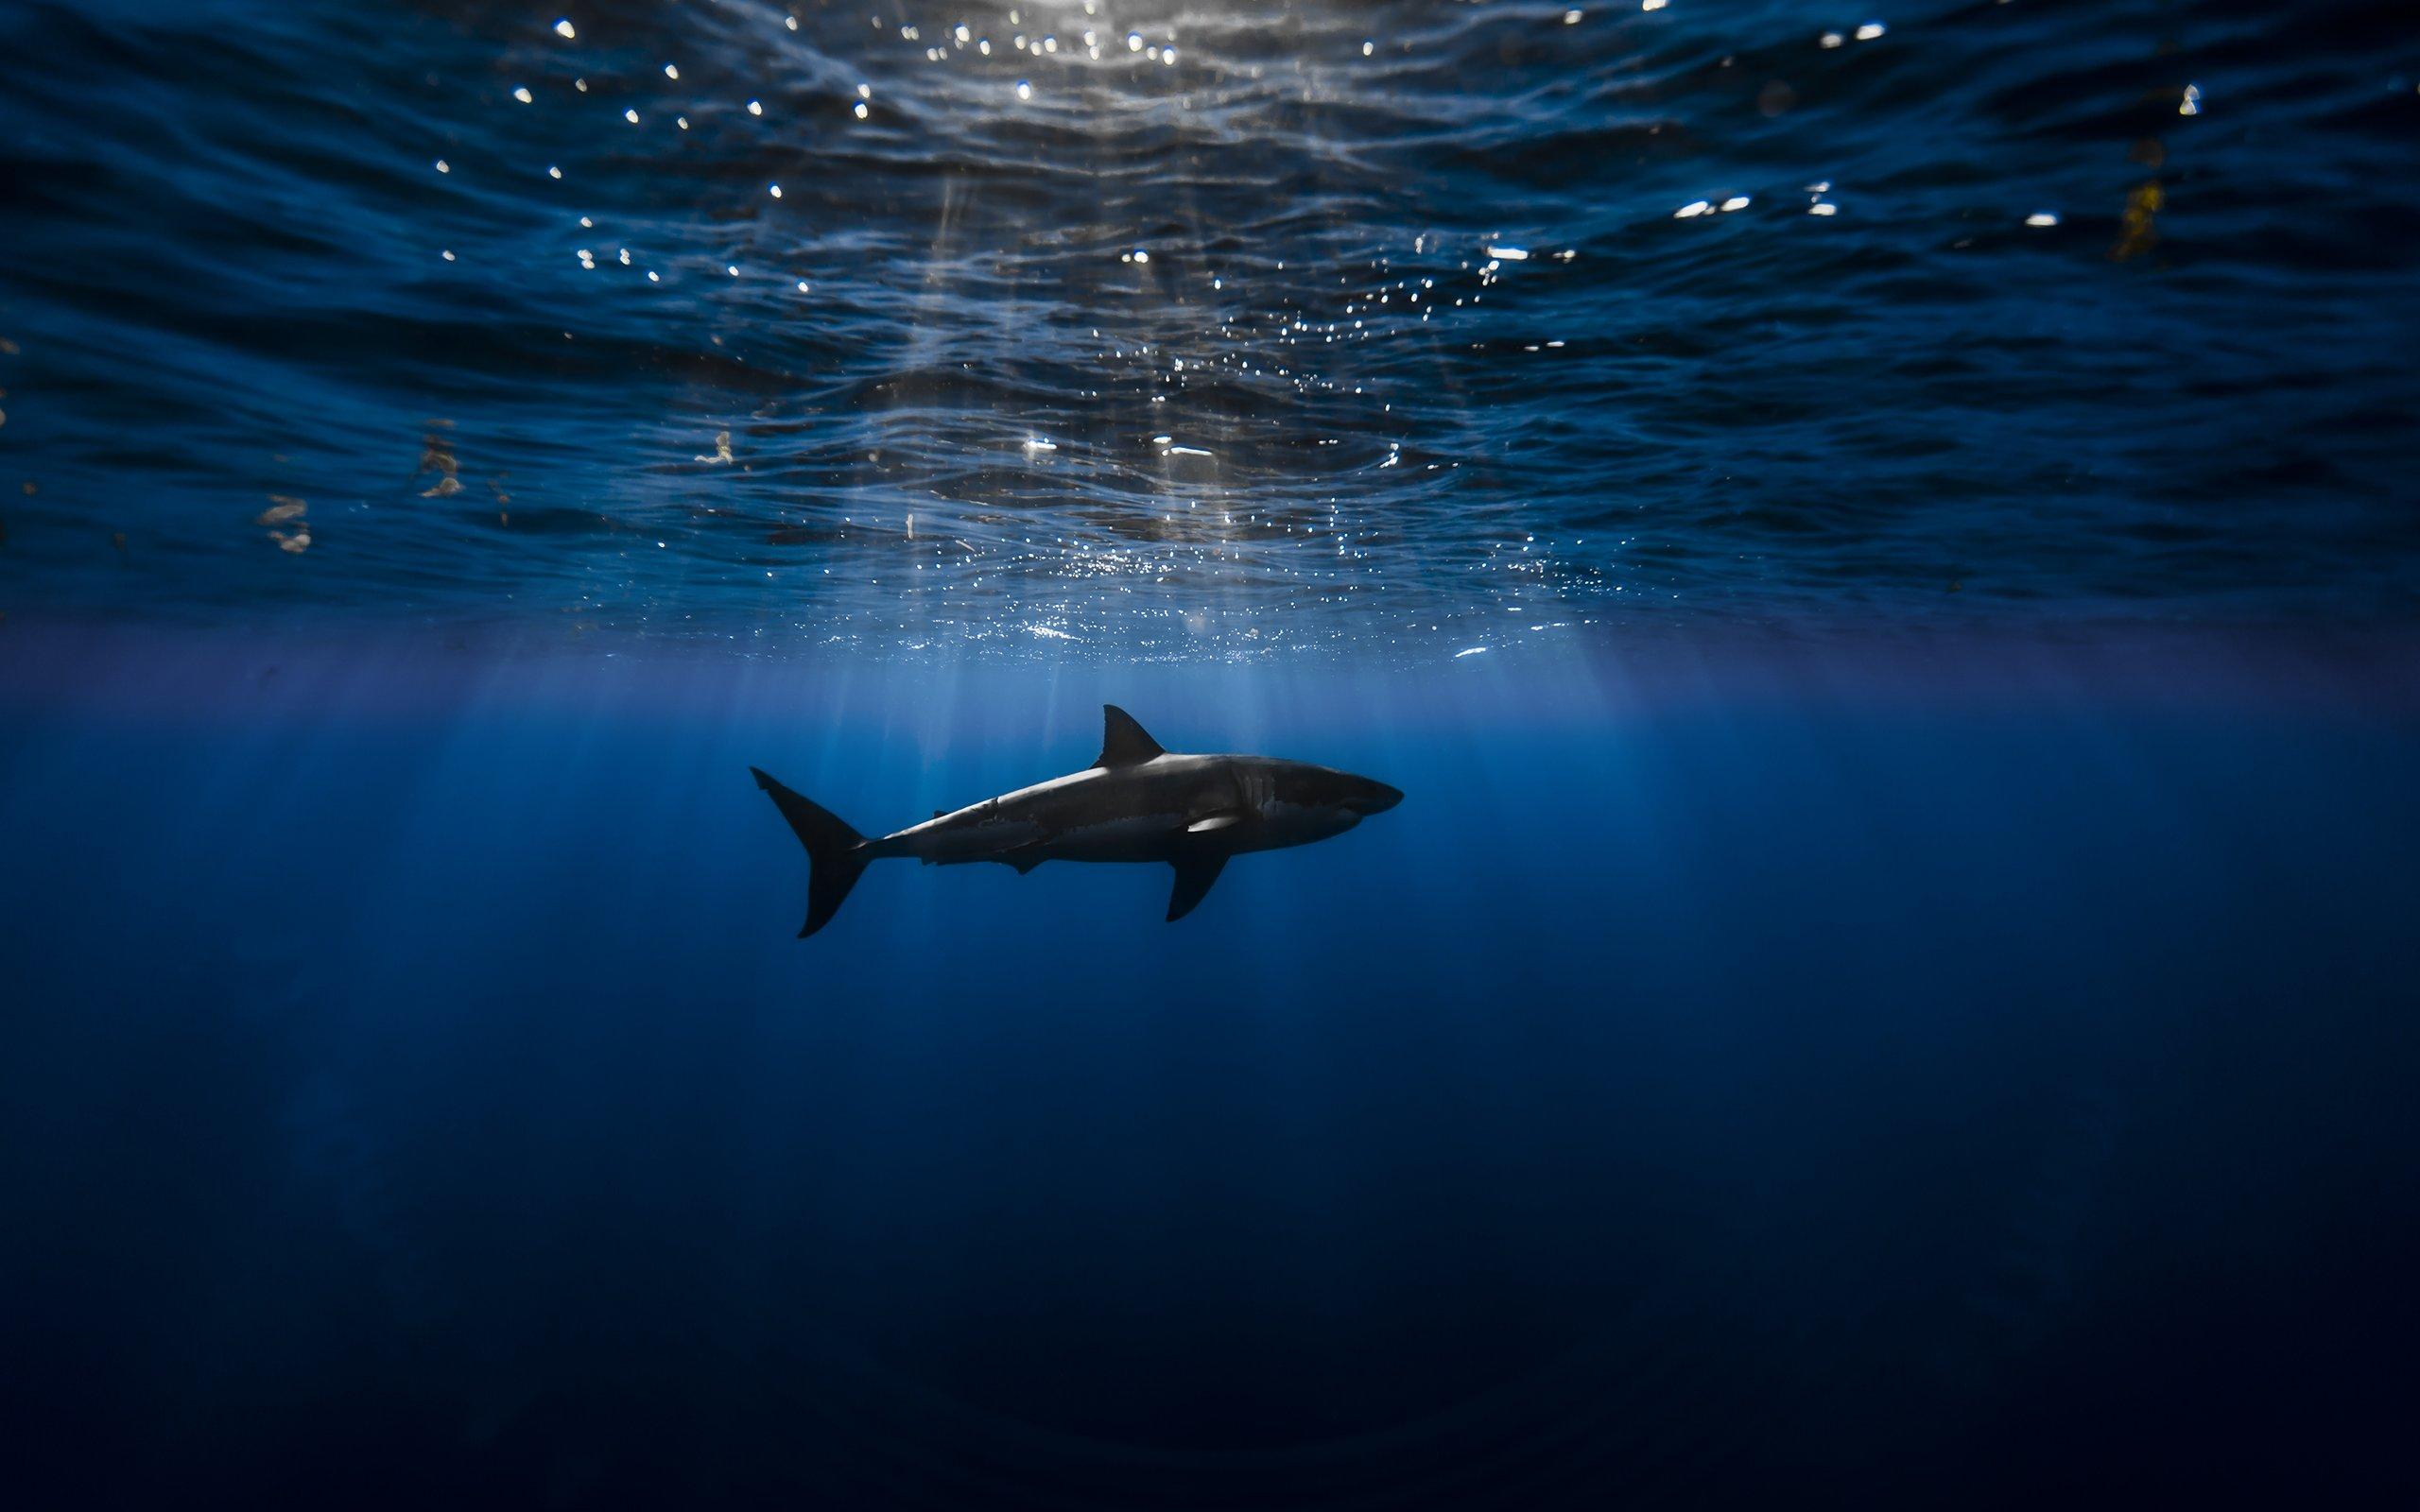 Underwater of a Shark HD wallpaper